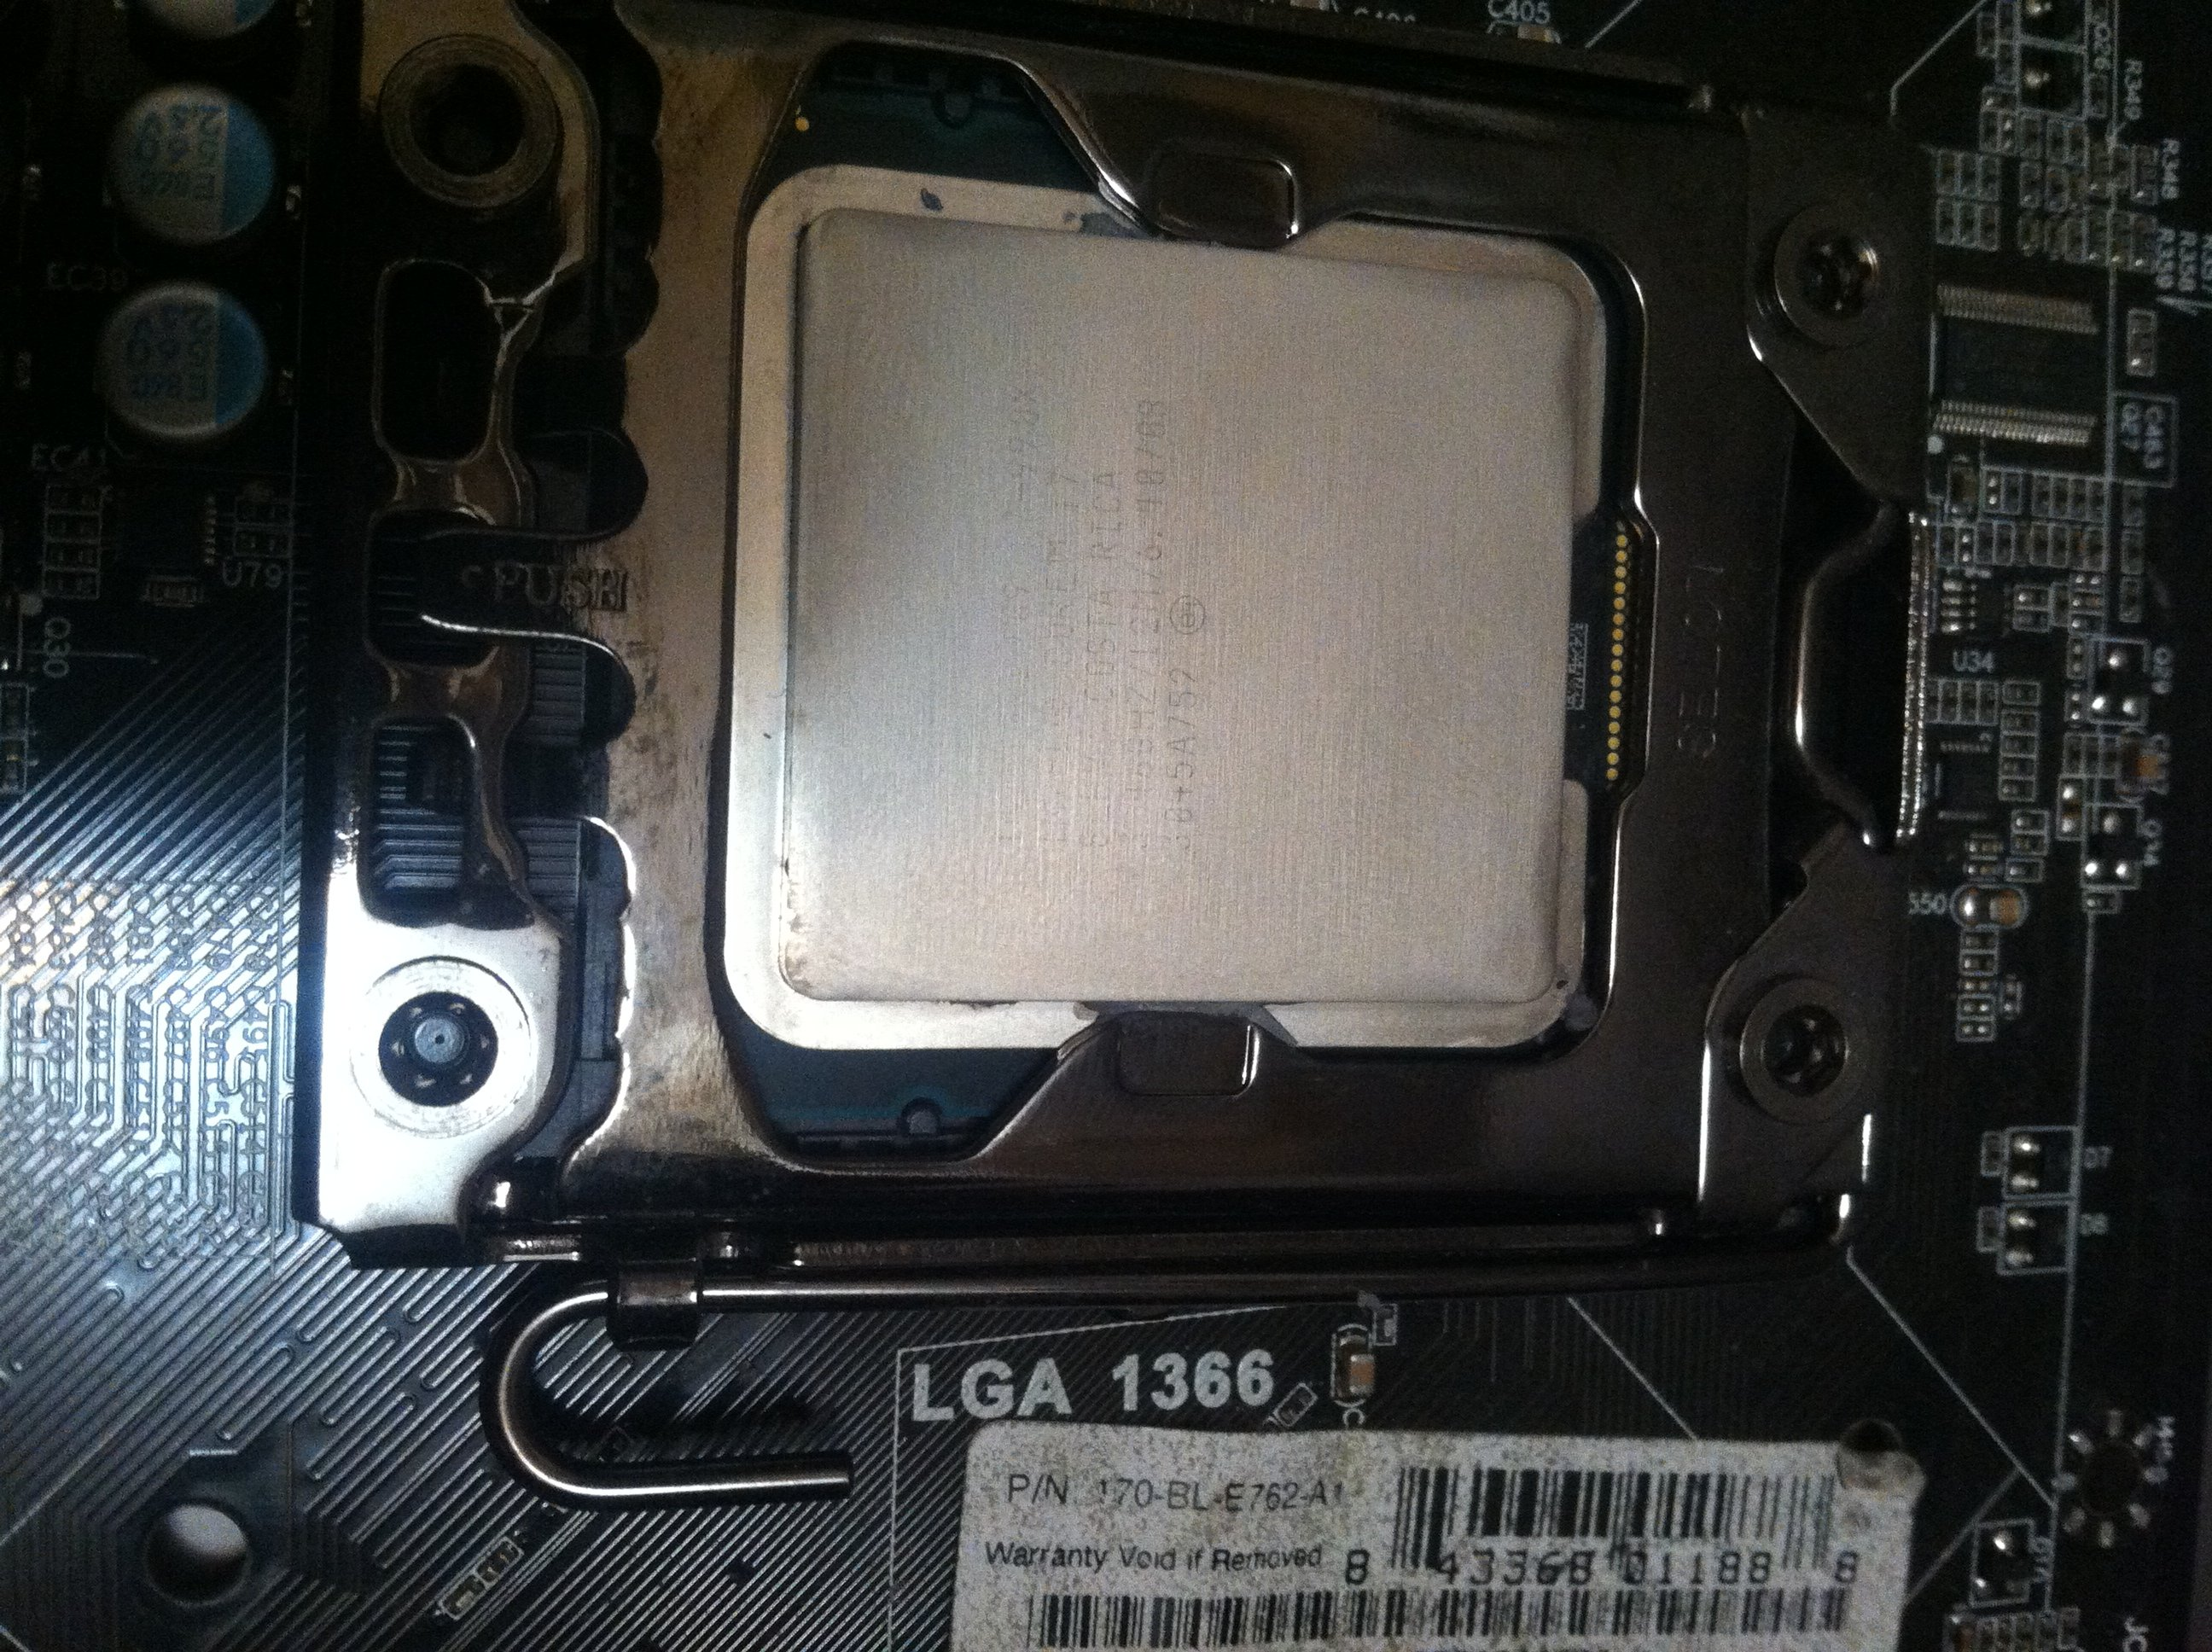 FT] - Evga X58 4way Sli Intel i7 990X   TechPowerUp Forums